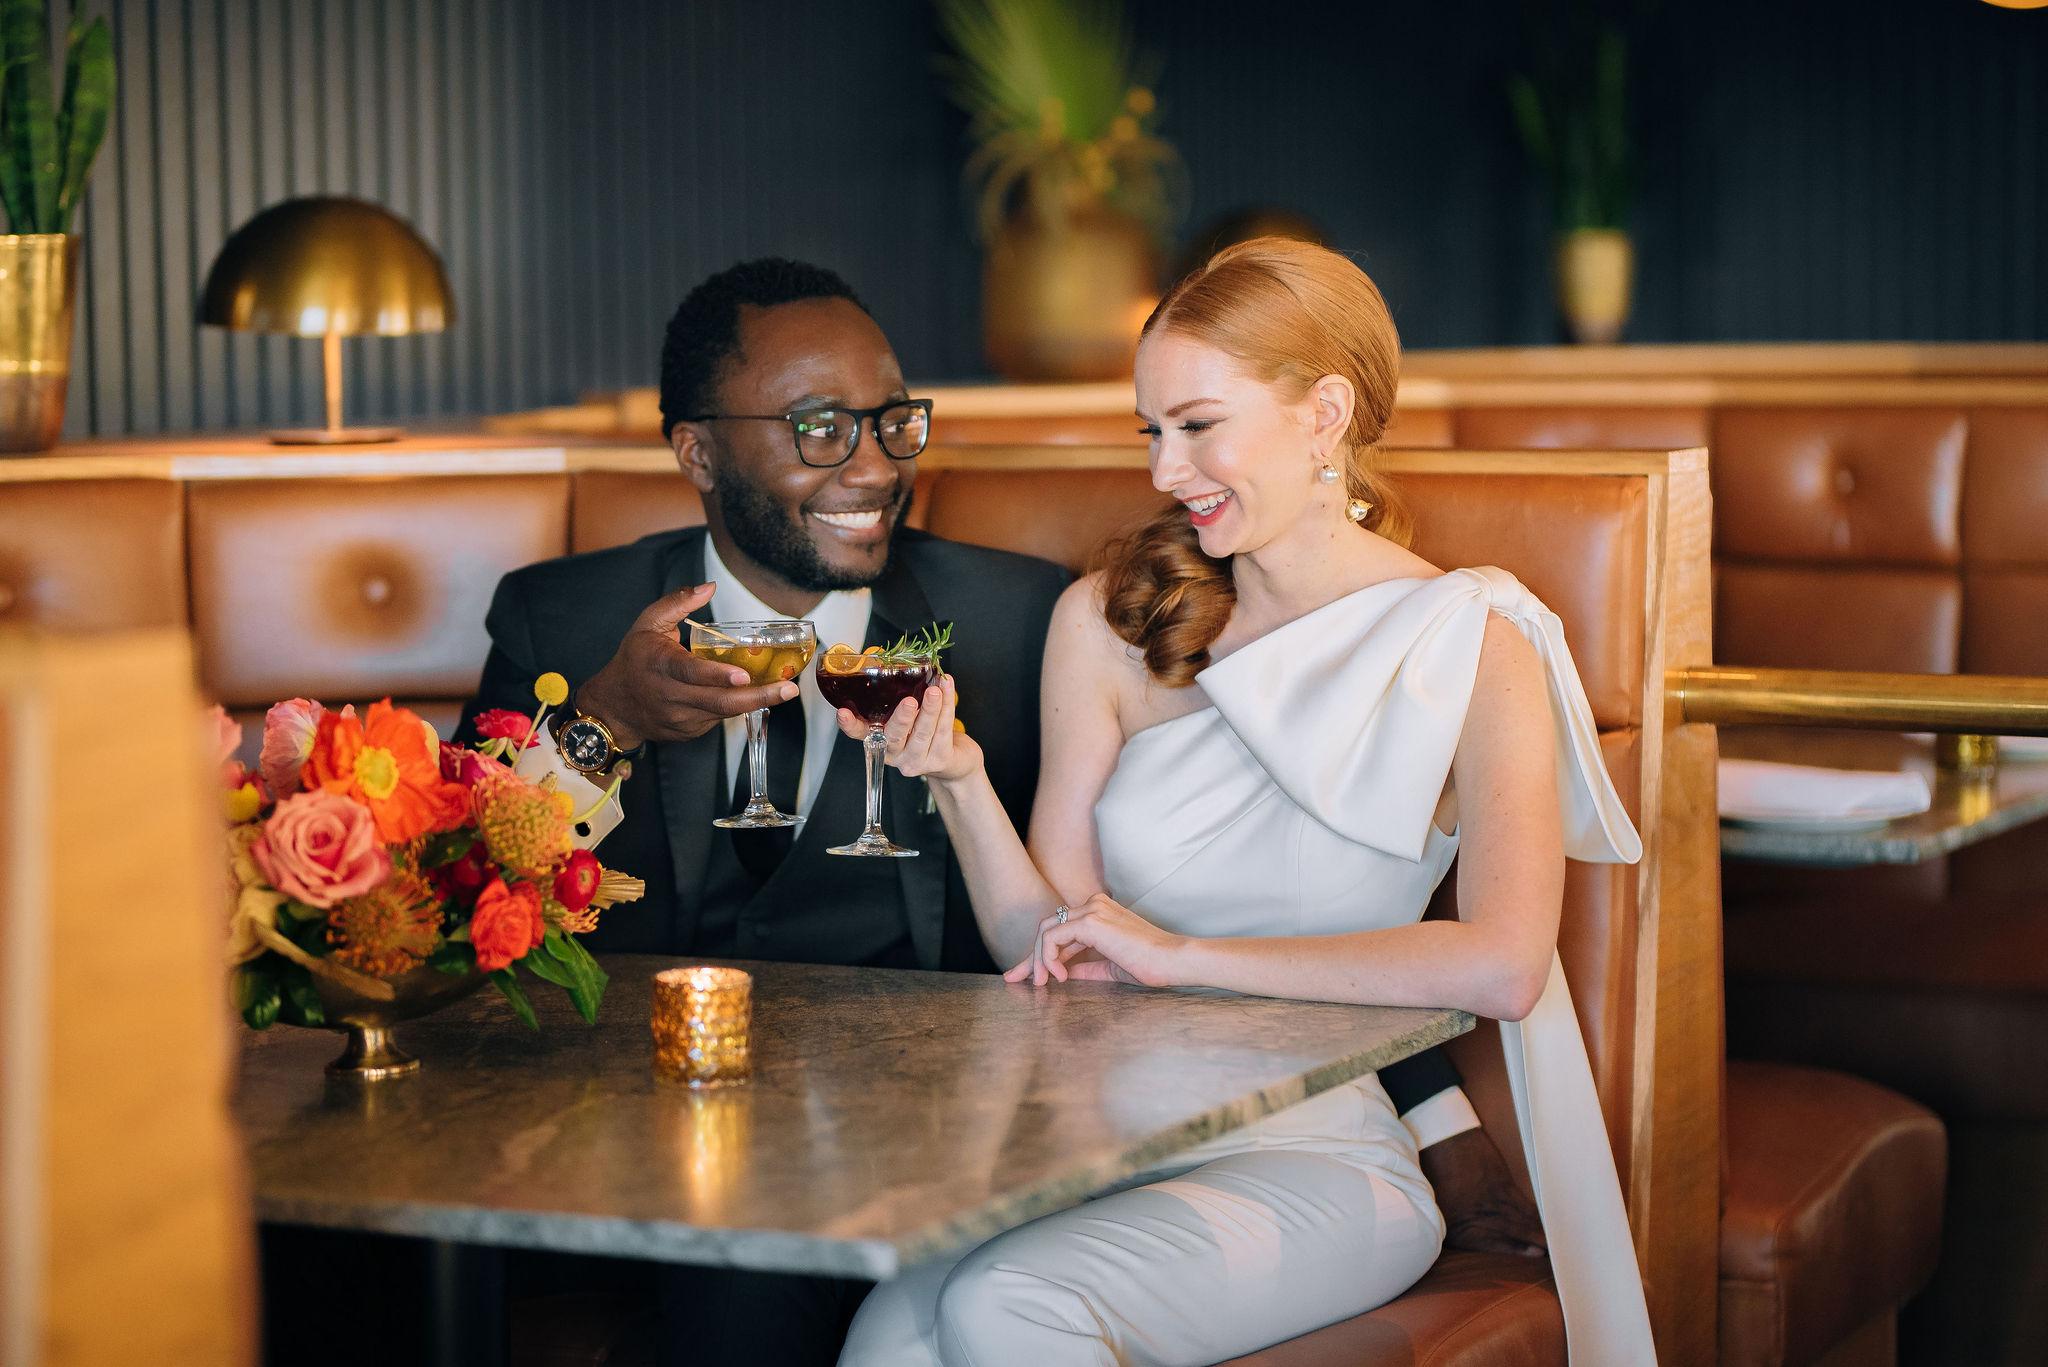 Retro Spring Styled Shoot at Fairlane Hotel   Nashville Bride Guide